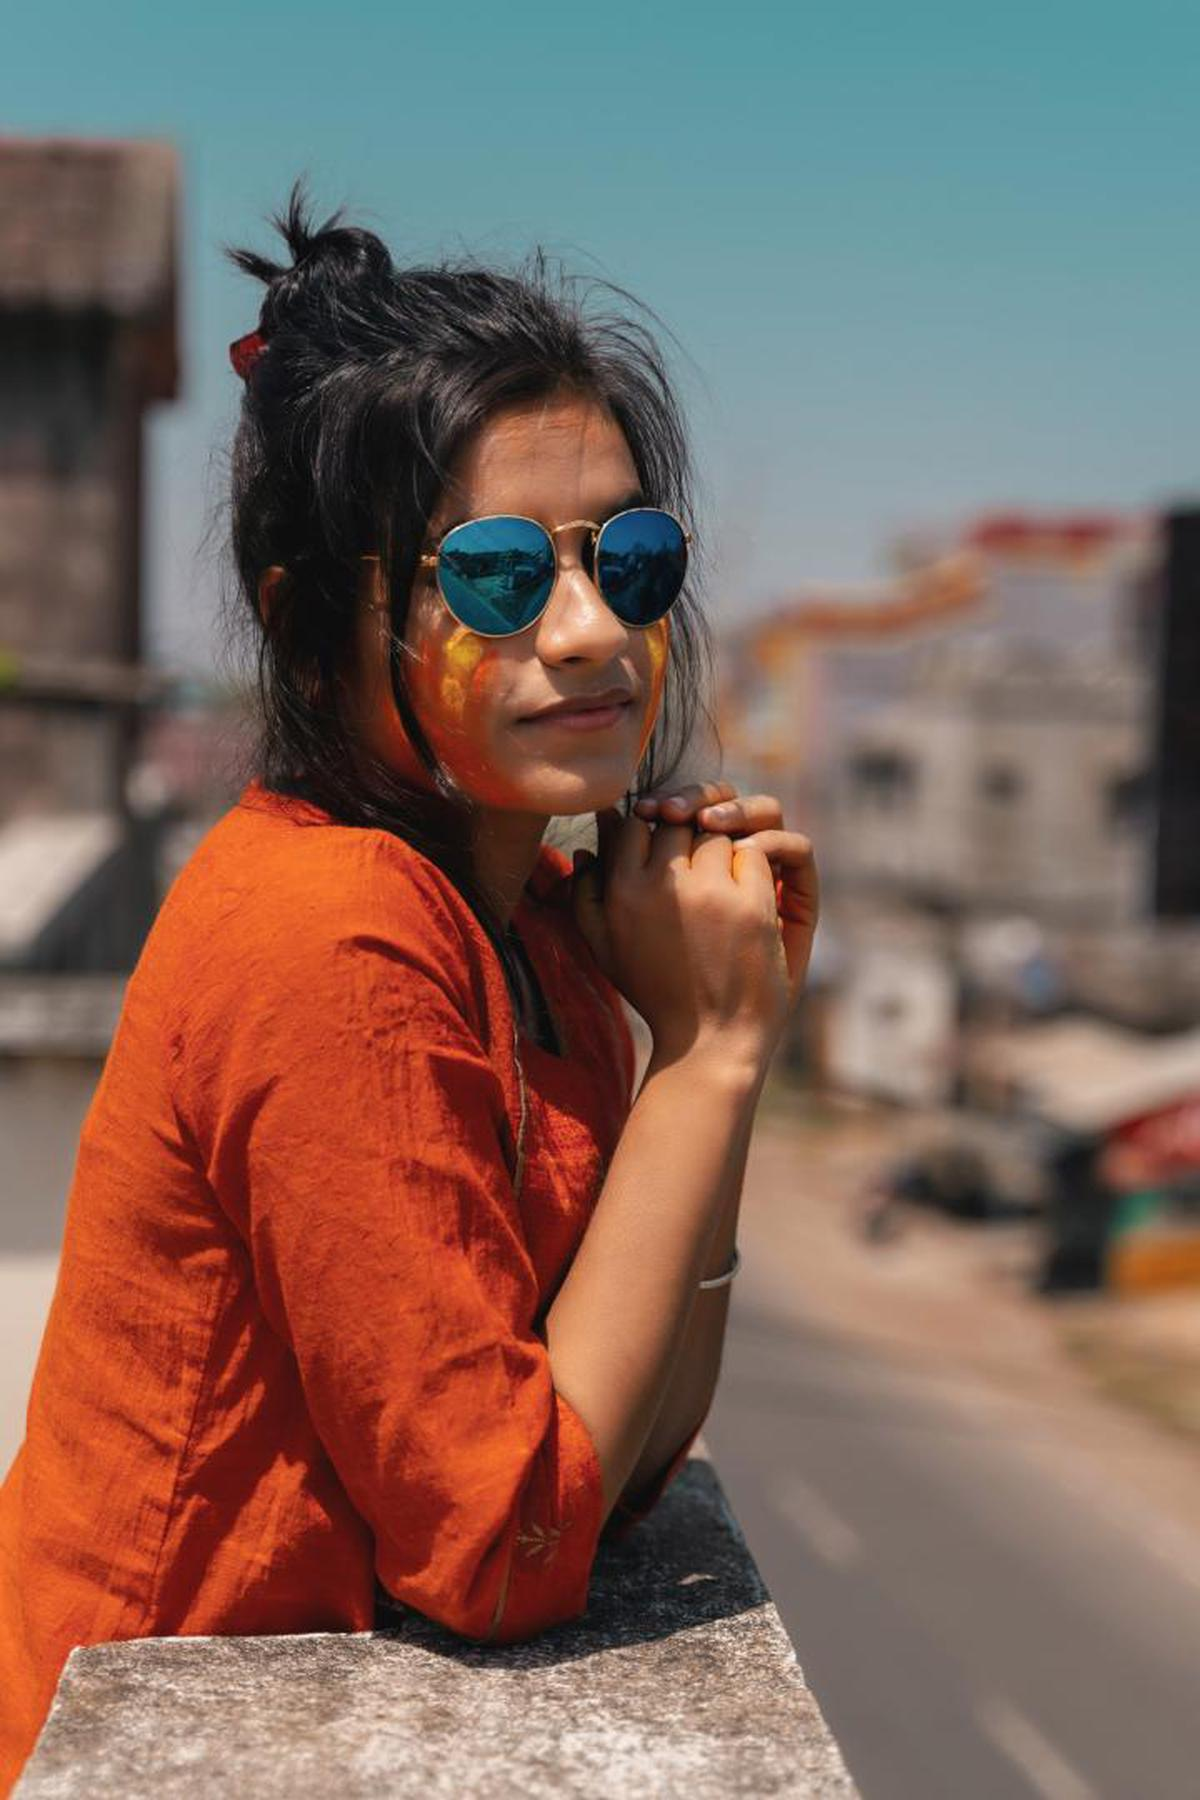 Image of Eyewear, Glasses, Sunglasses, Cool, Hairstyle etc.